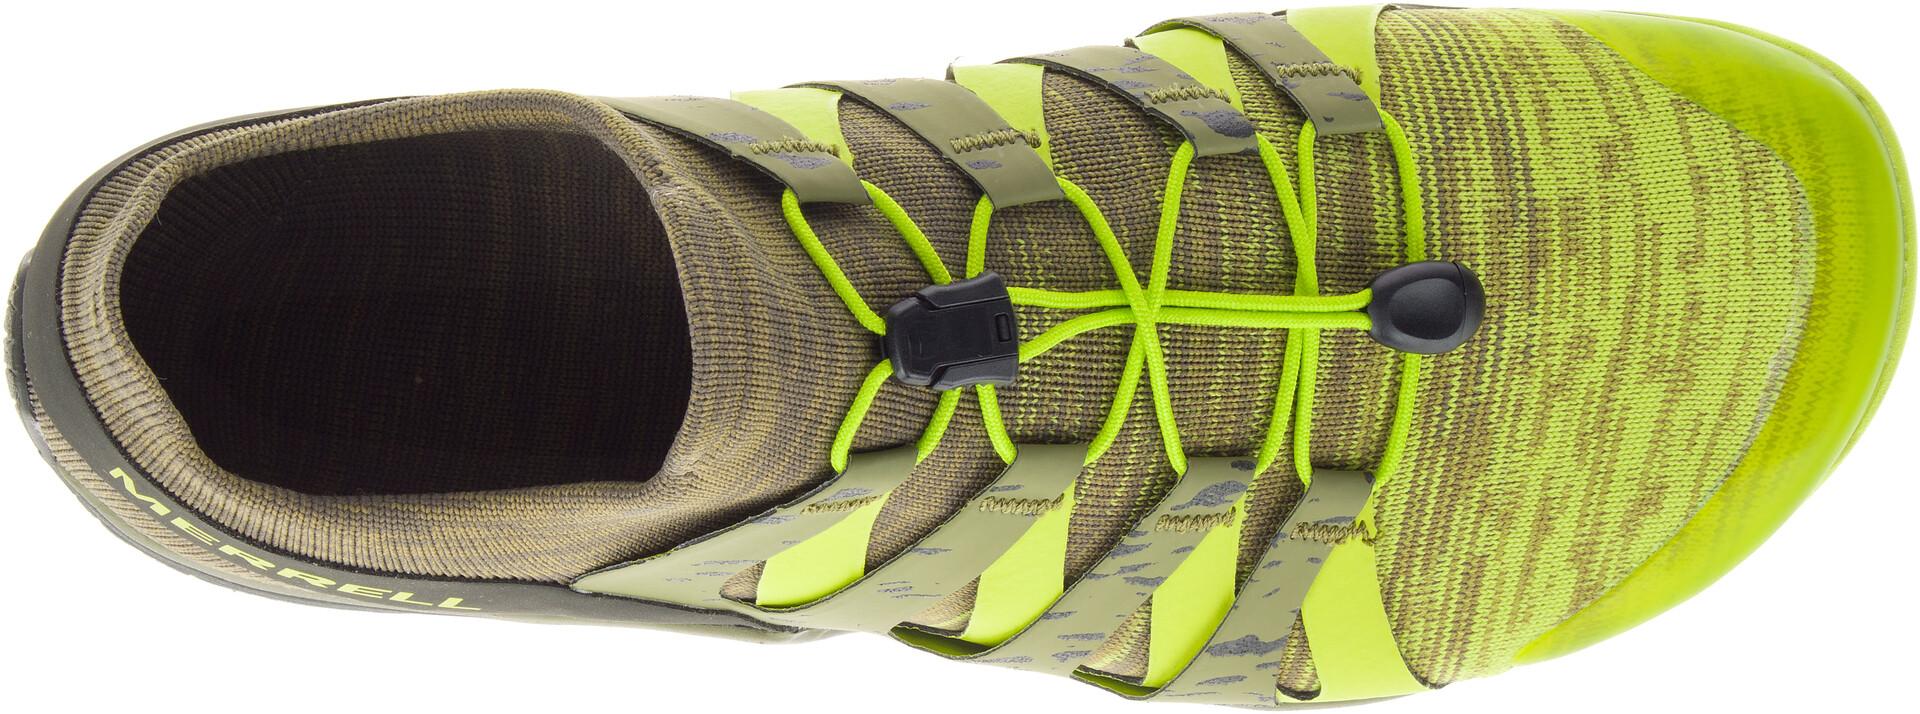 Glove Trail 3d De HommeLime 5 Chaussures Punch Boutique Merrell OnPkw08